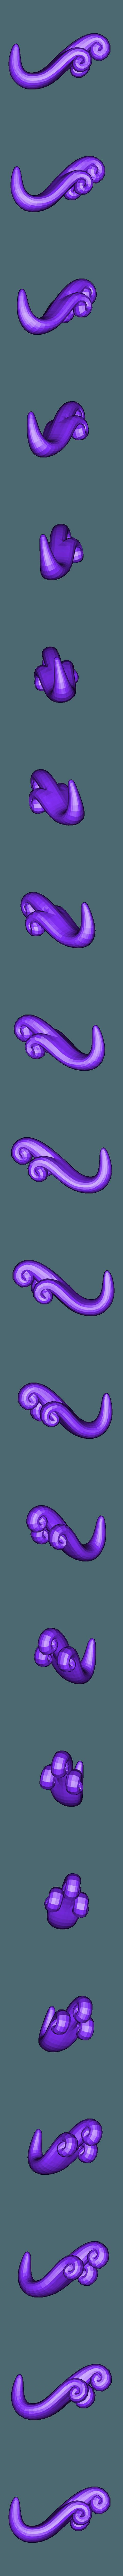 cura_sweetiebelle_queue.stl Download free STL file Sweetiebelle MLP Pony  • 3D printable template, arcandg